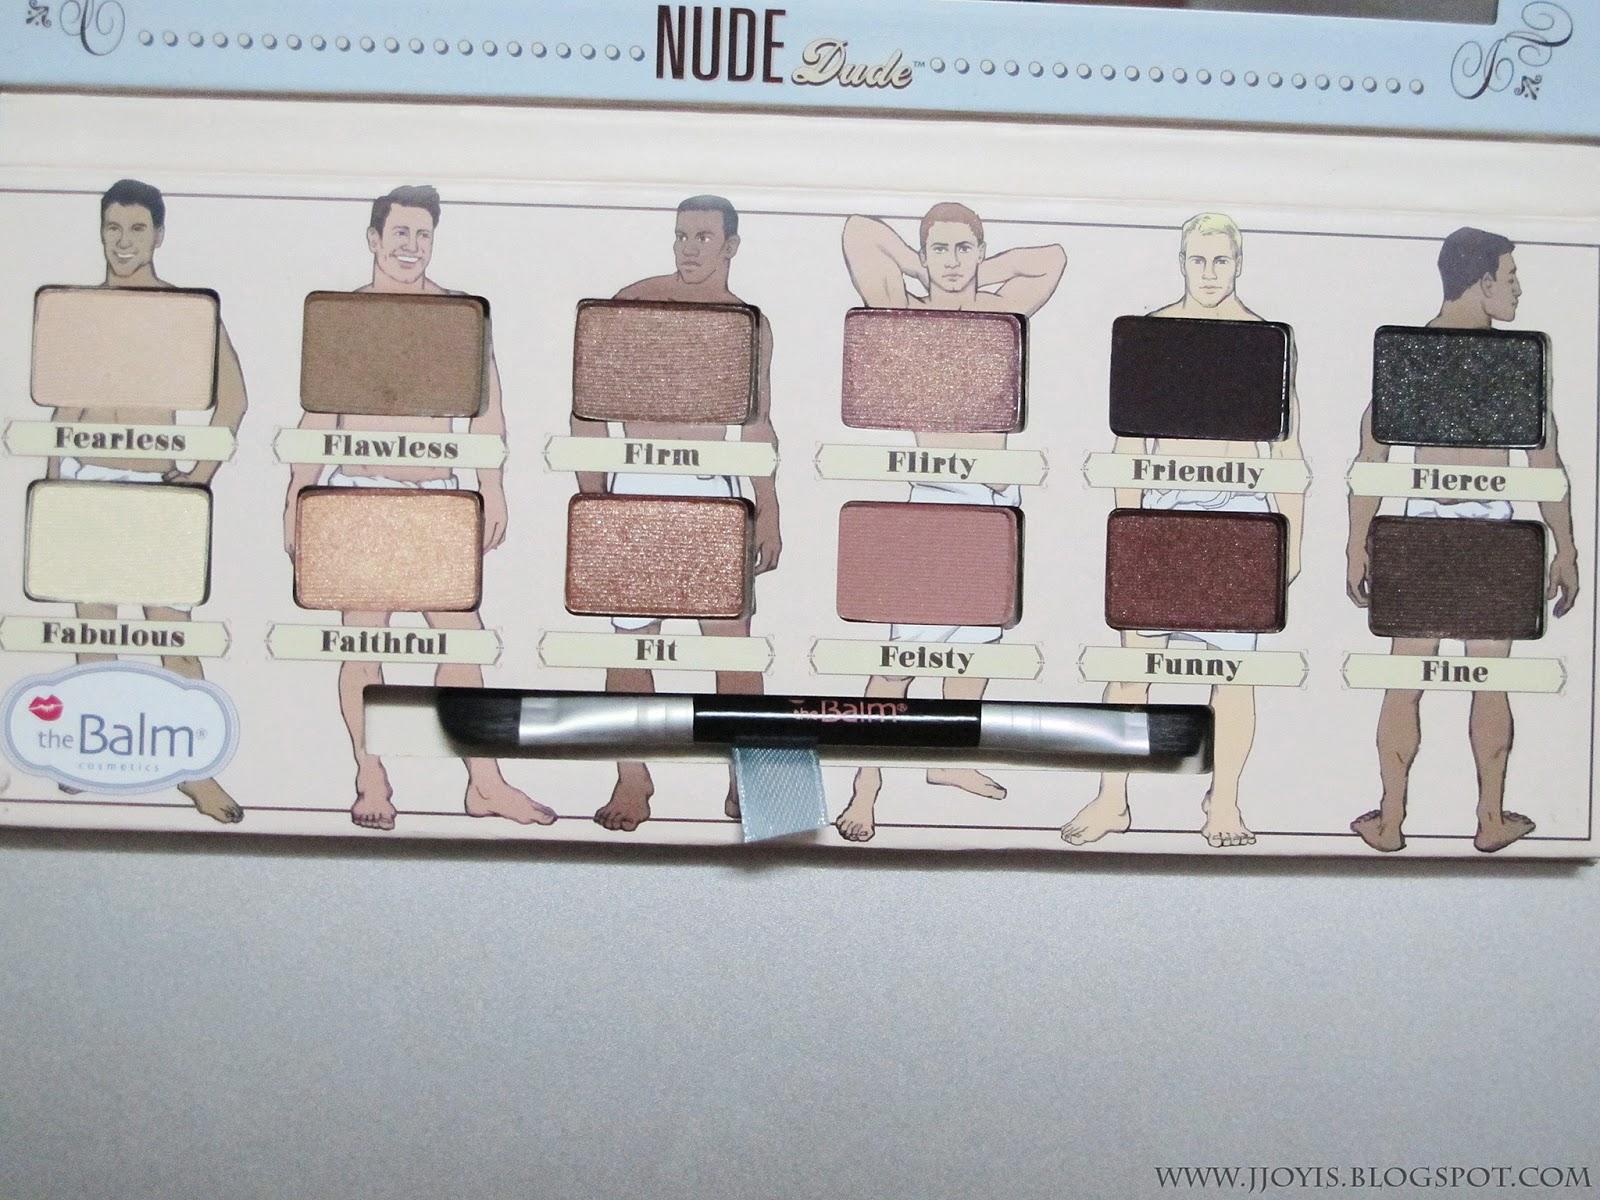 theBalm Cosmetics, Nude Dude, Volume 2, Nude Eyeshadow